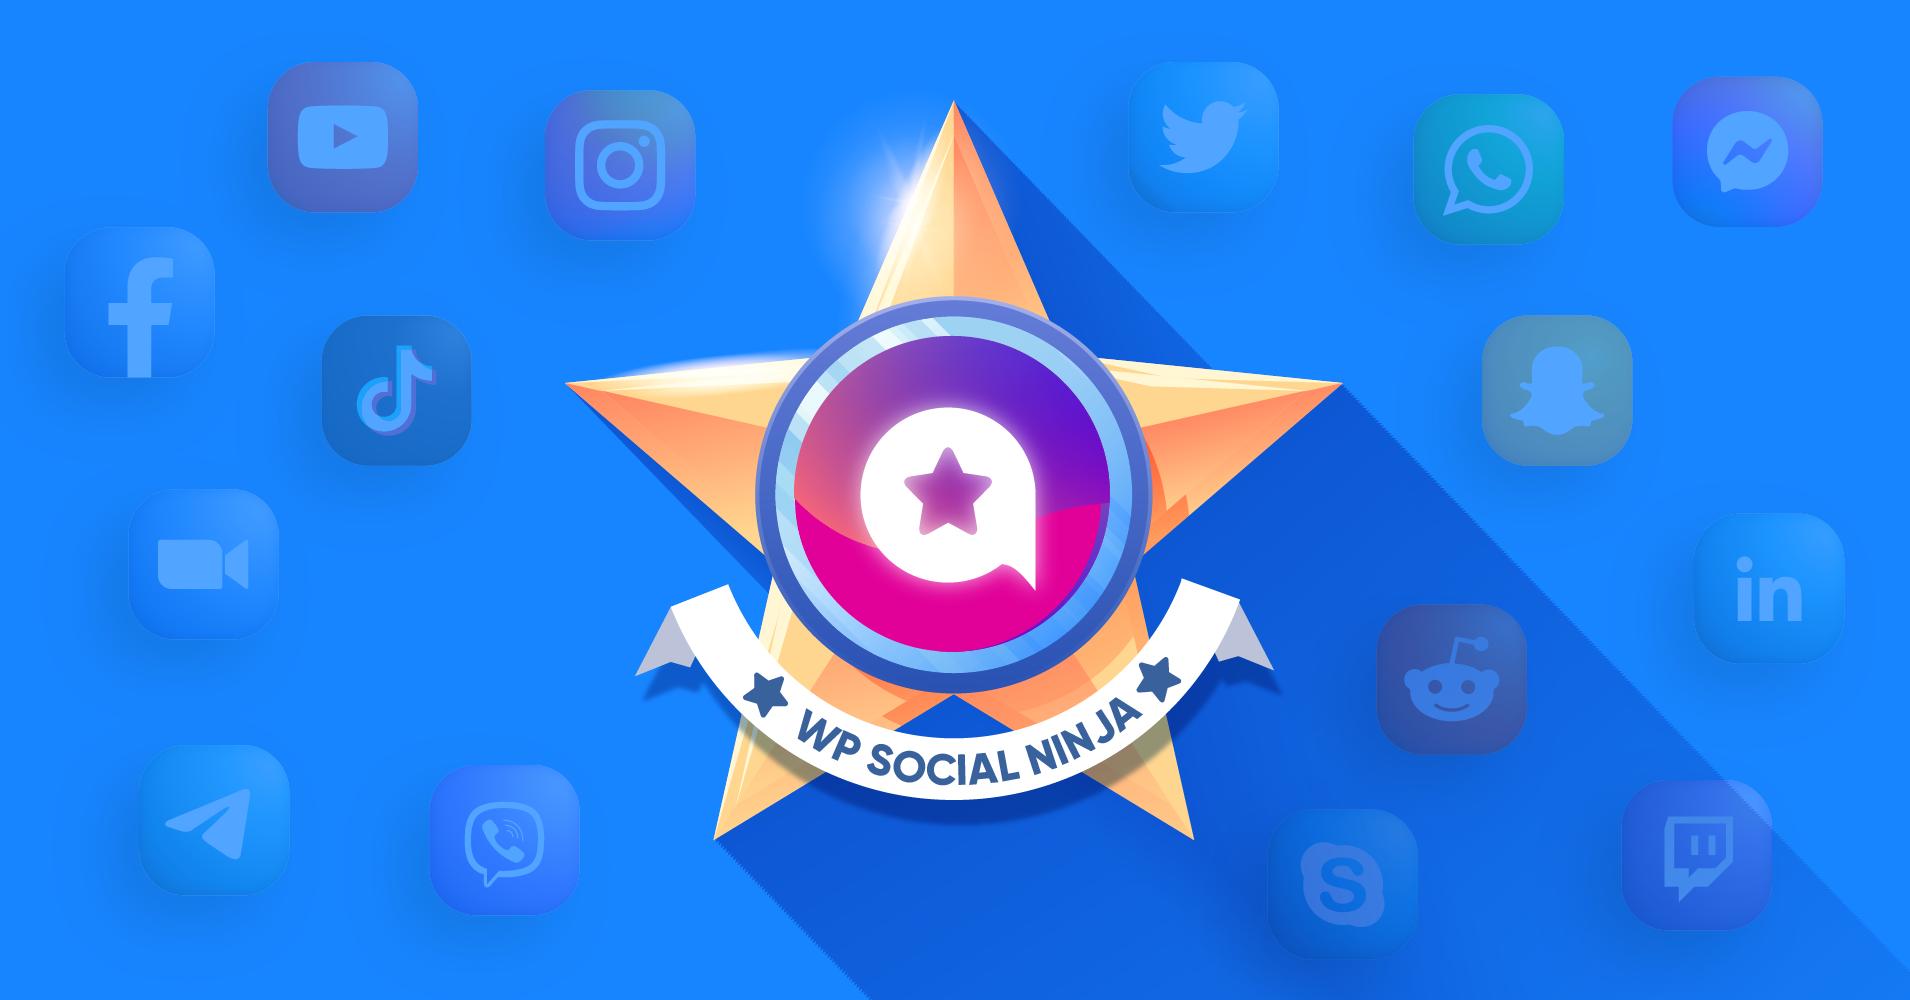 WP Social Ninja: The Best Social Media Plugin for WordPress